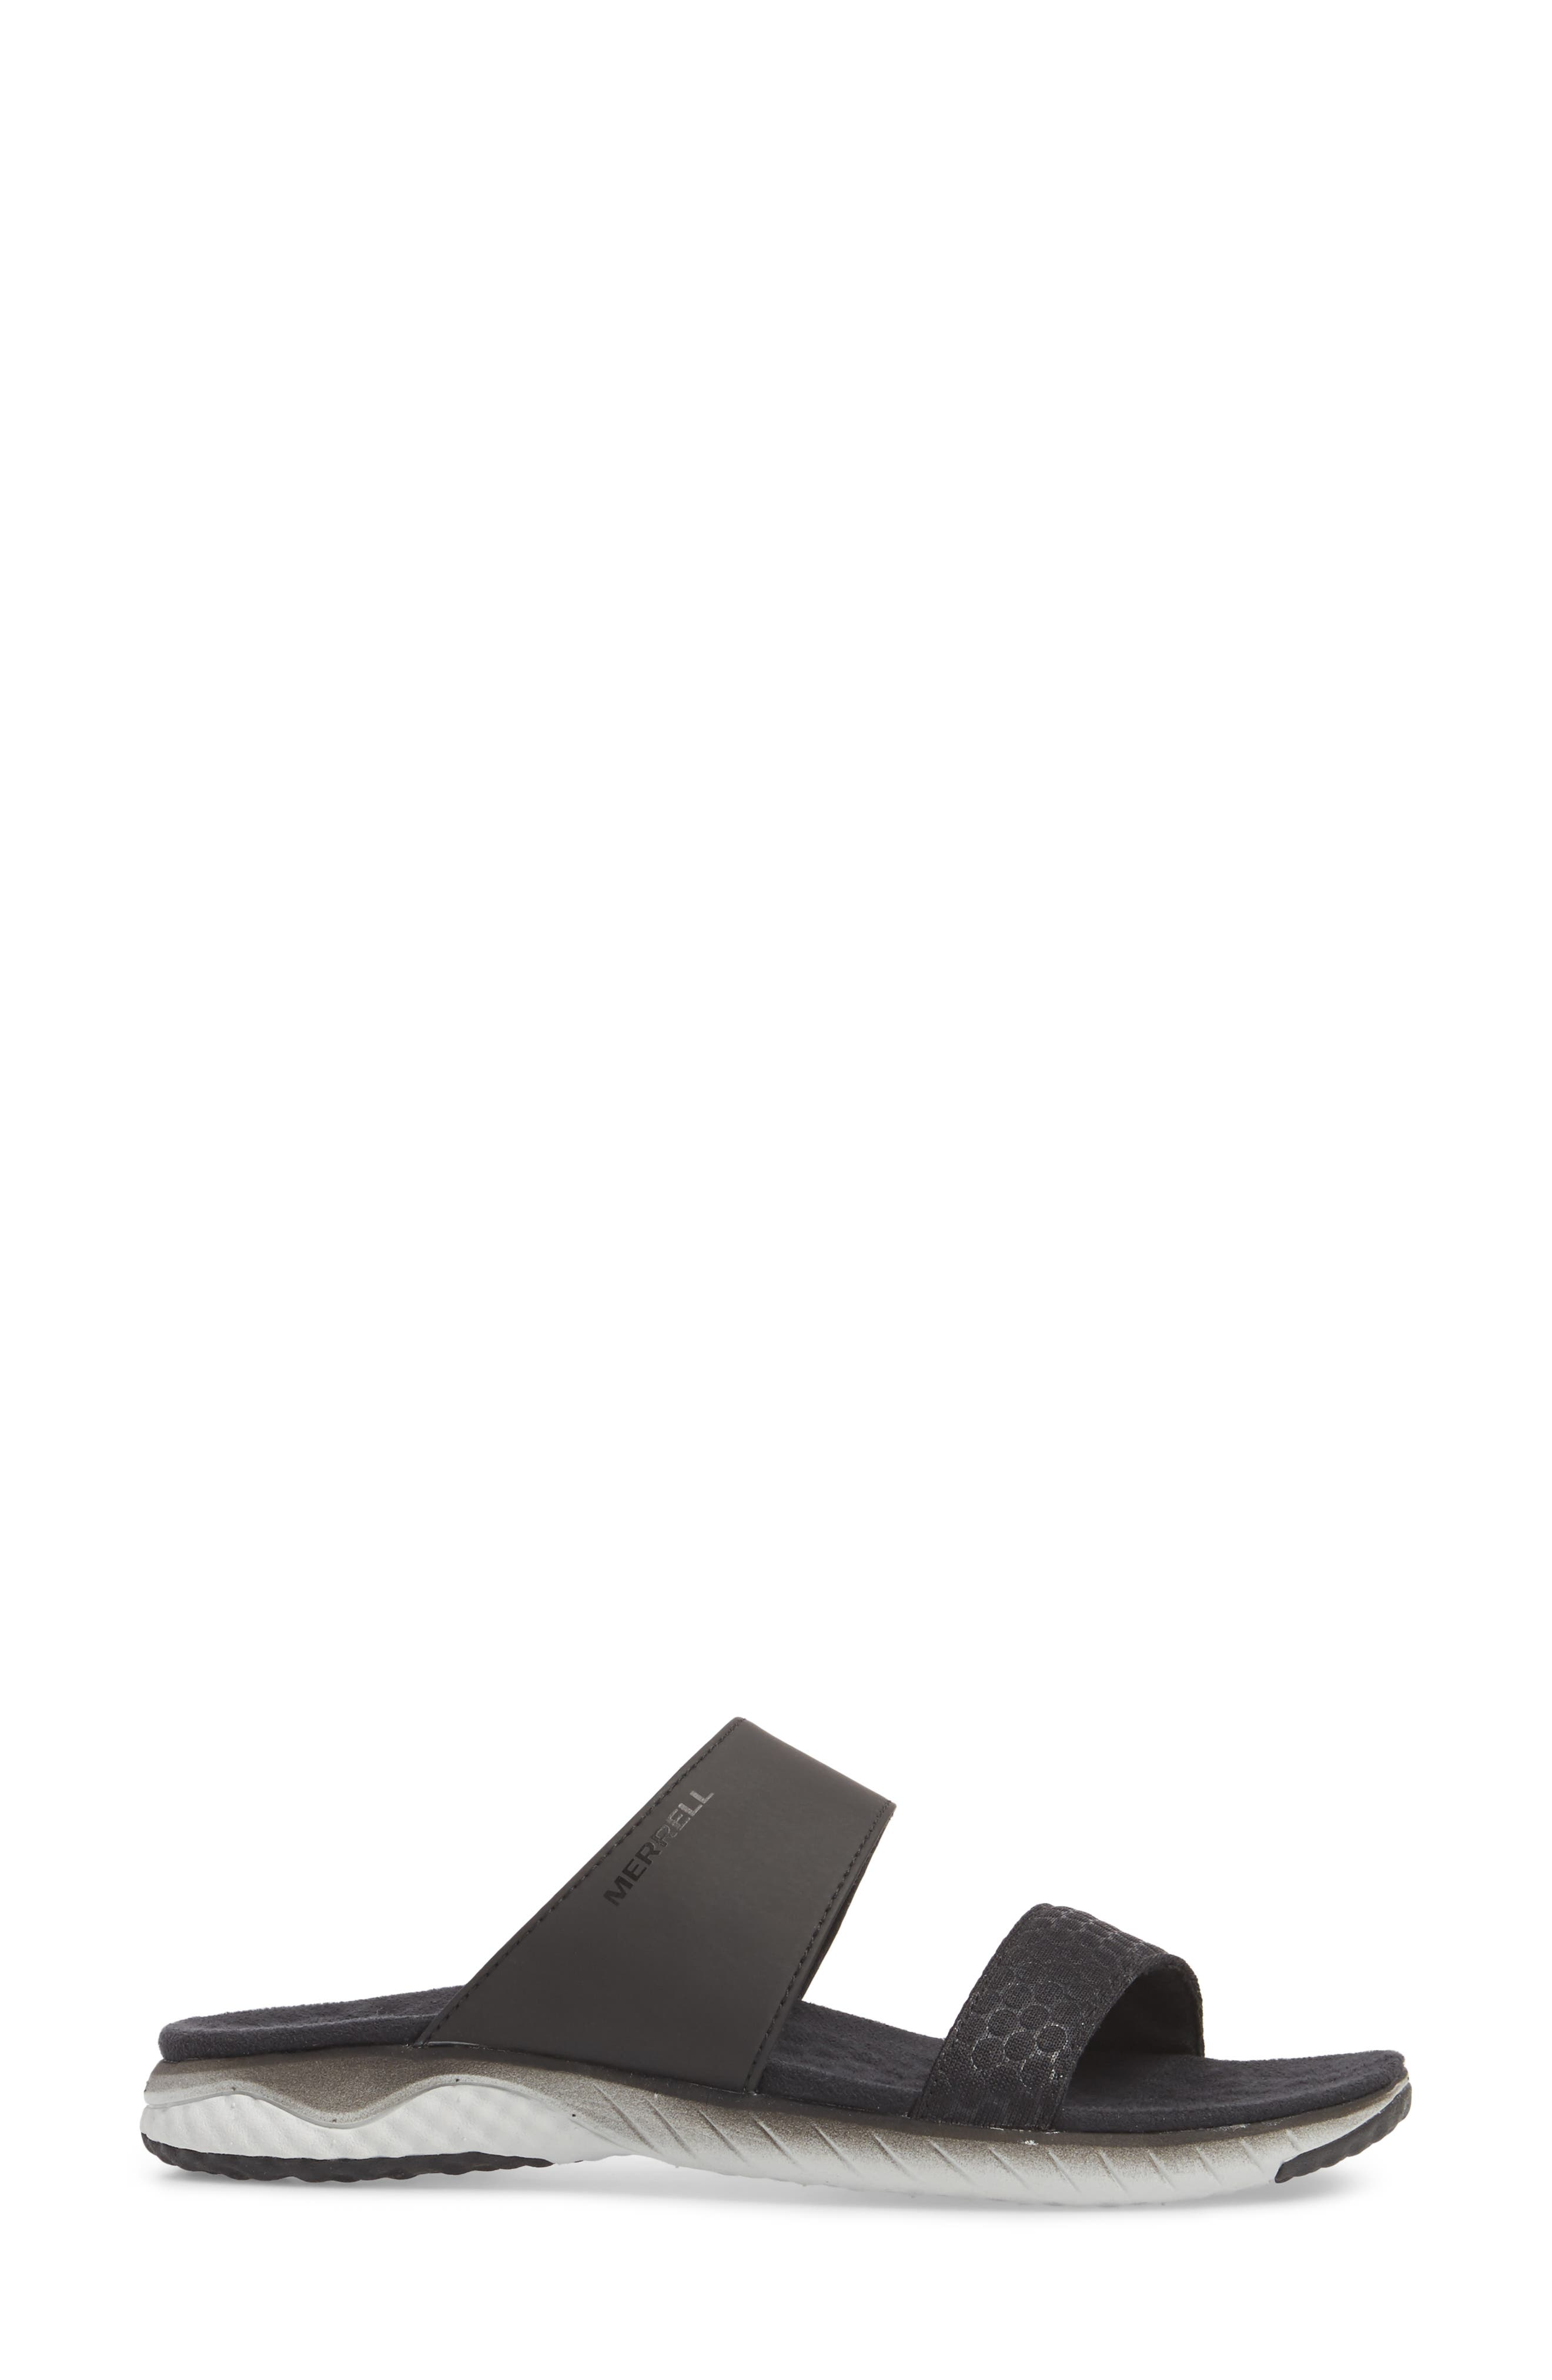 1SIX8 Linna Air Cushion+ Slide Sandal,                             Alternate thumbnail 3, color,                             Black